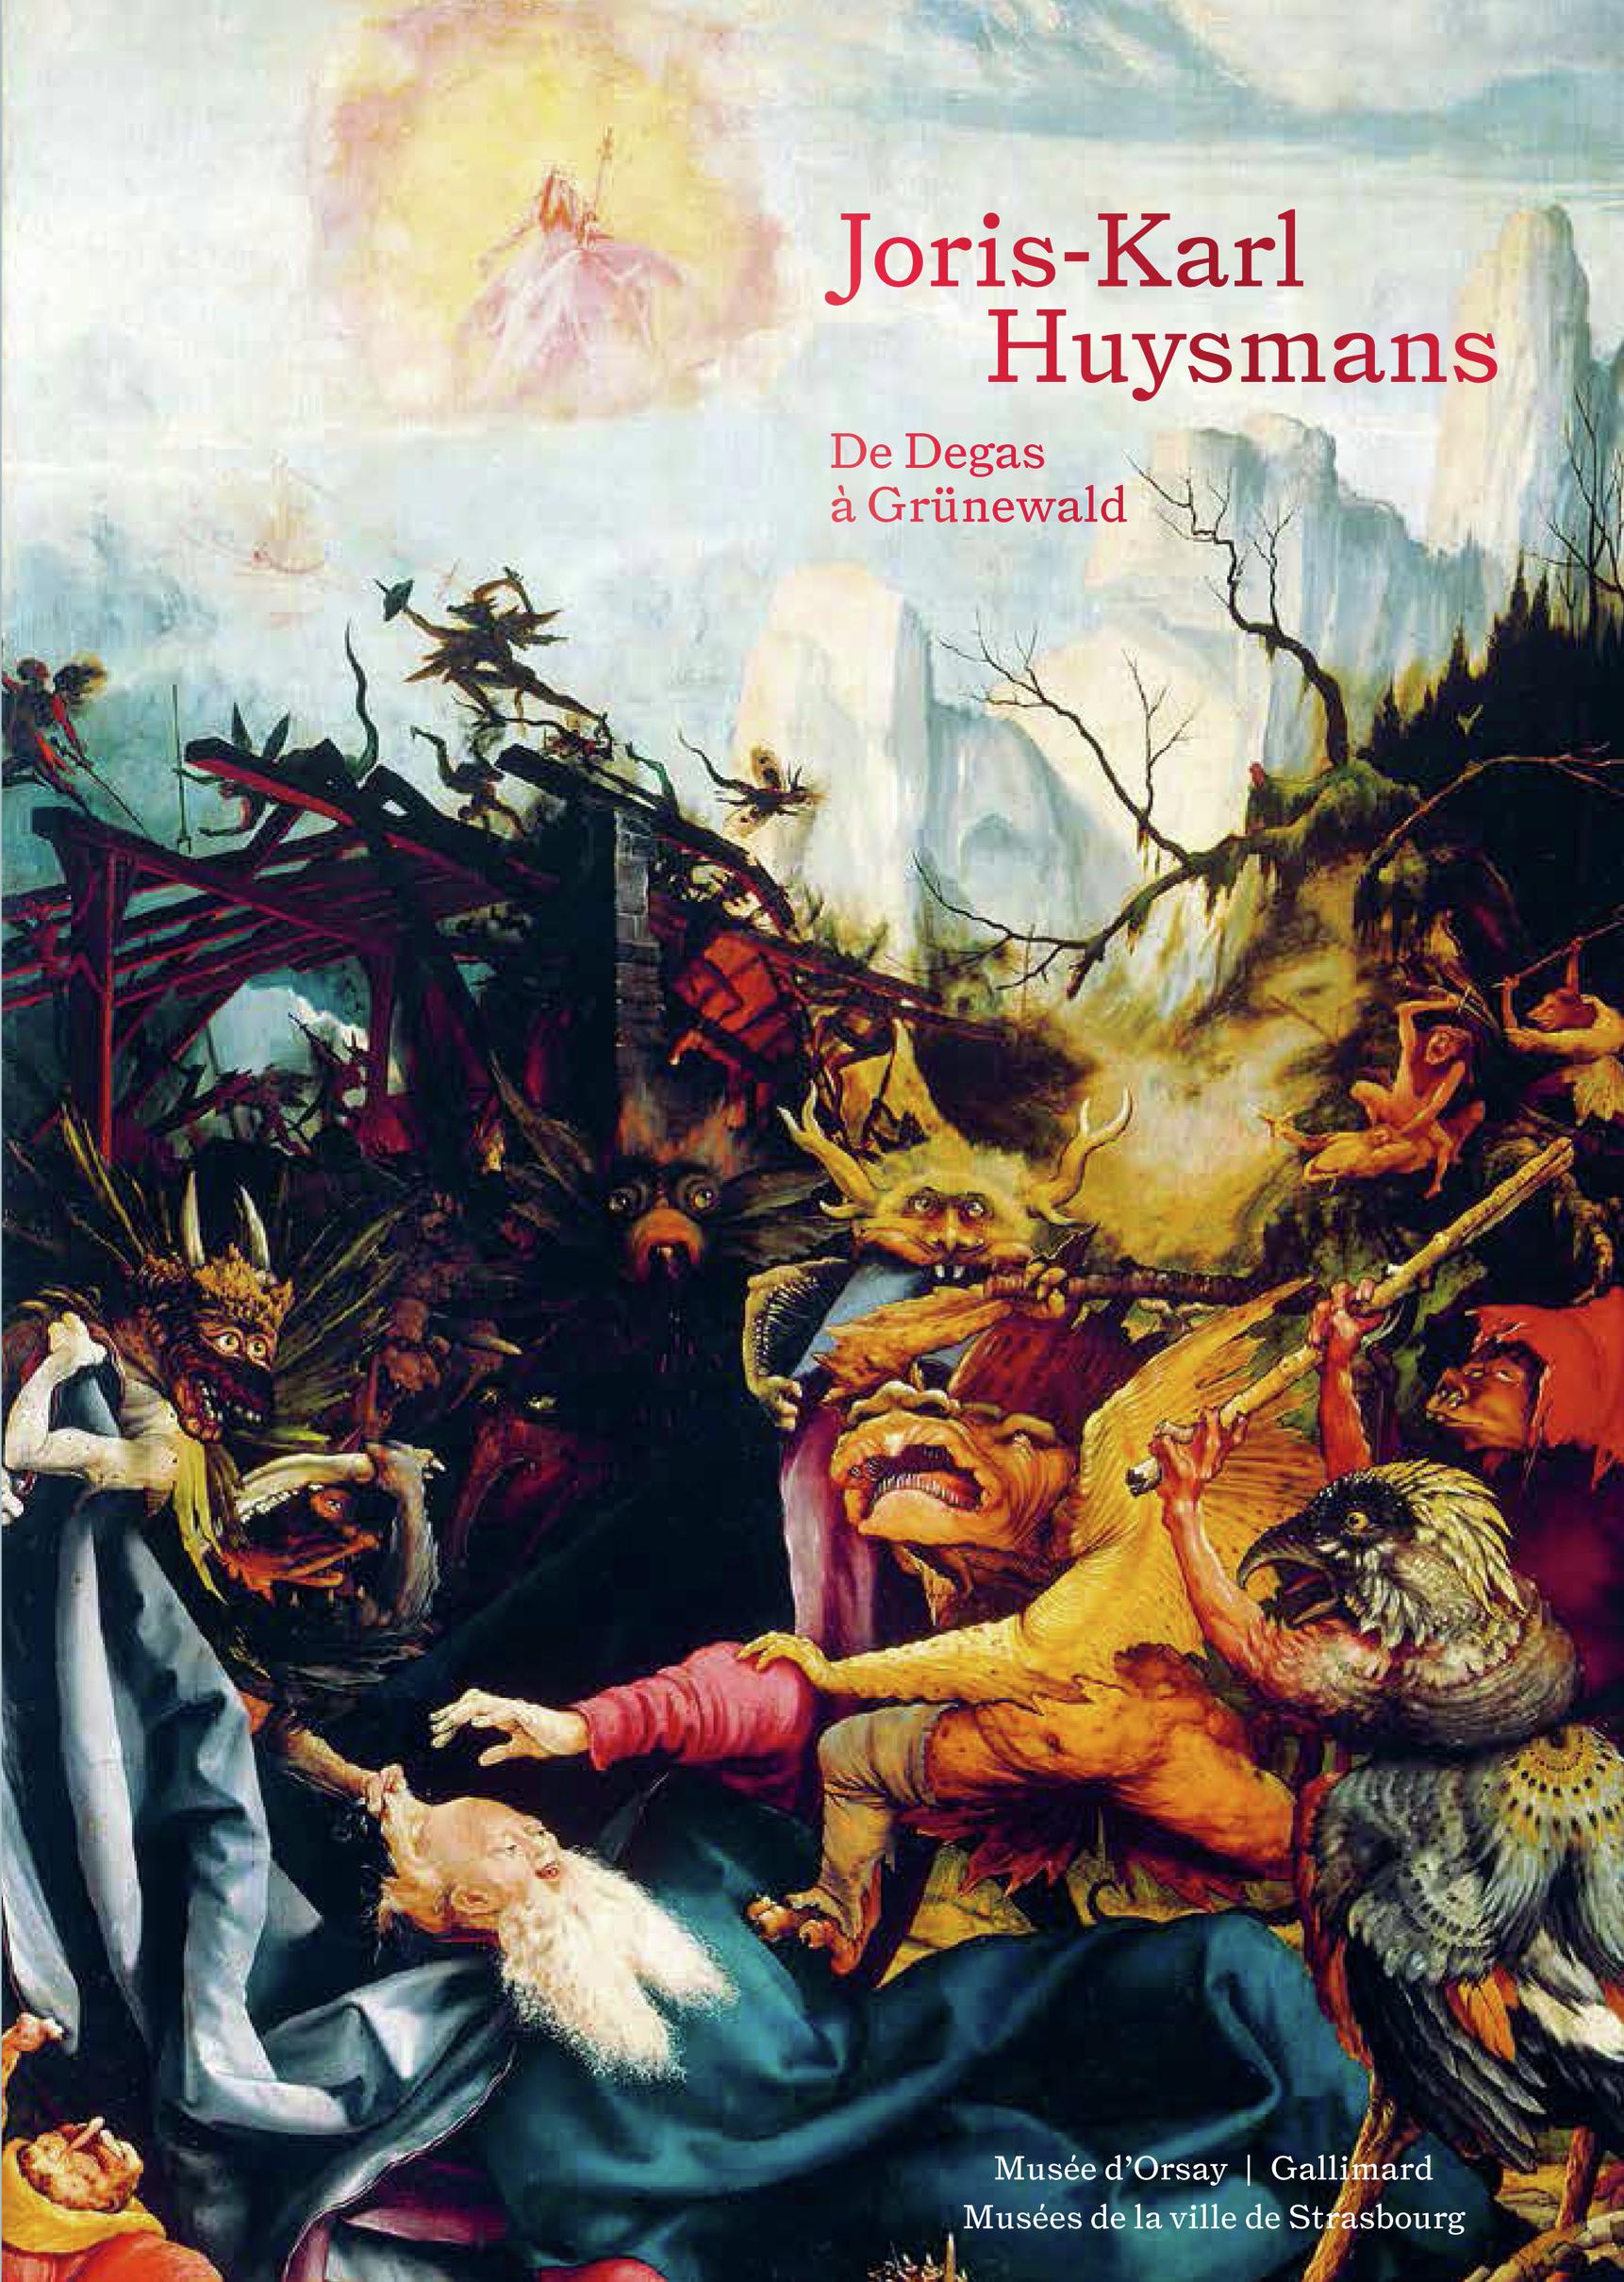 JORIS-KARL HUYSMANS - DE DEGAS A GRUNEWALD